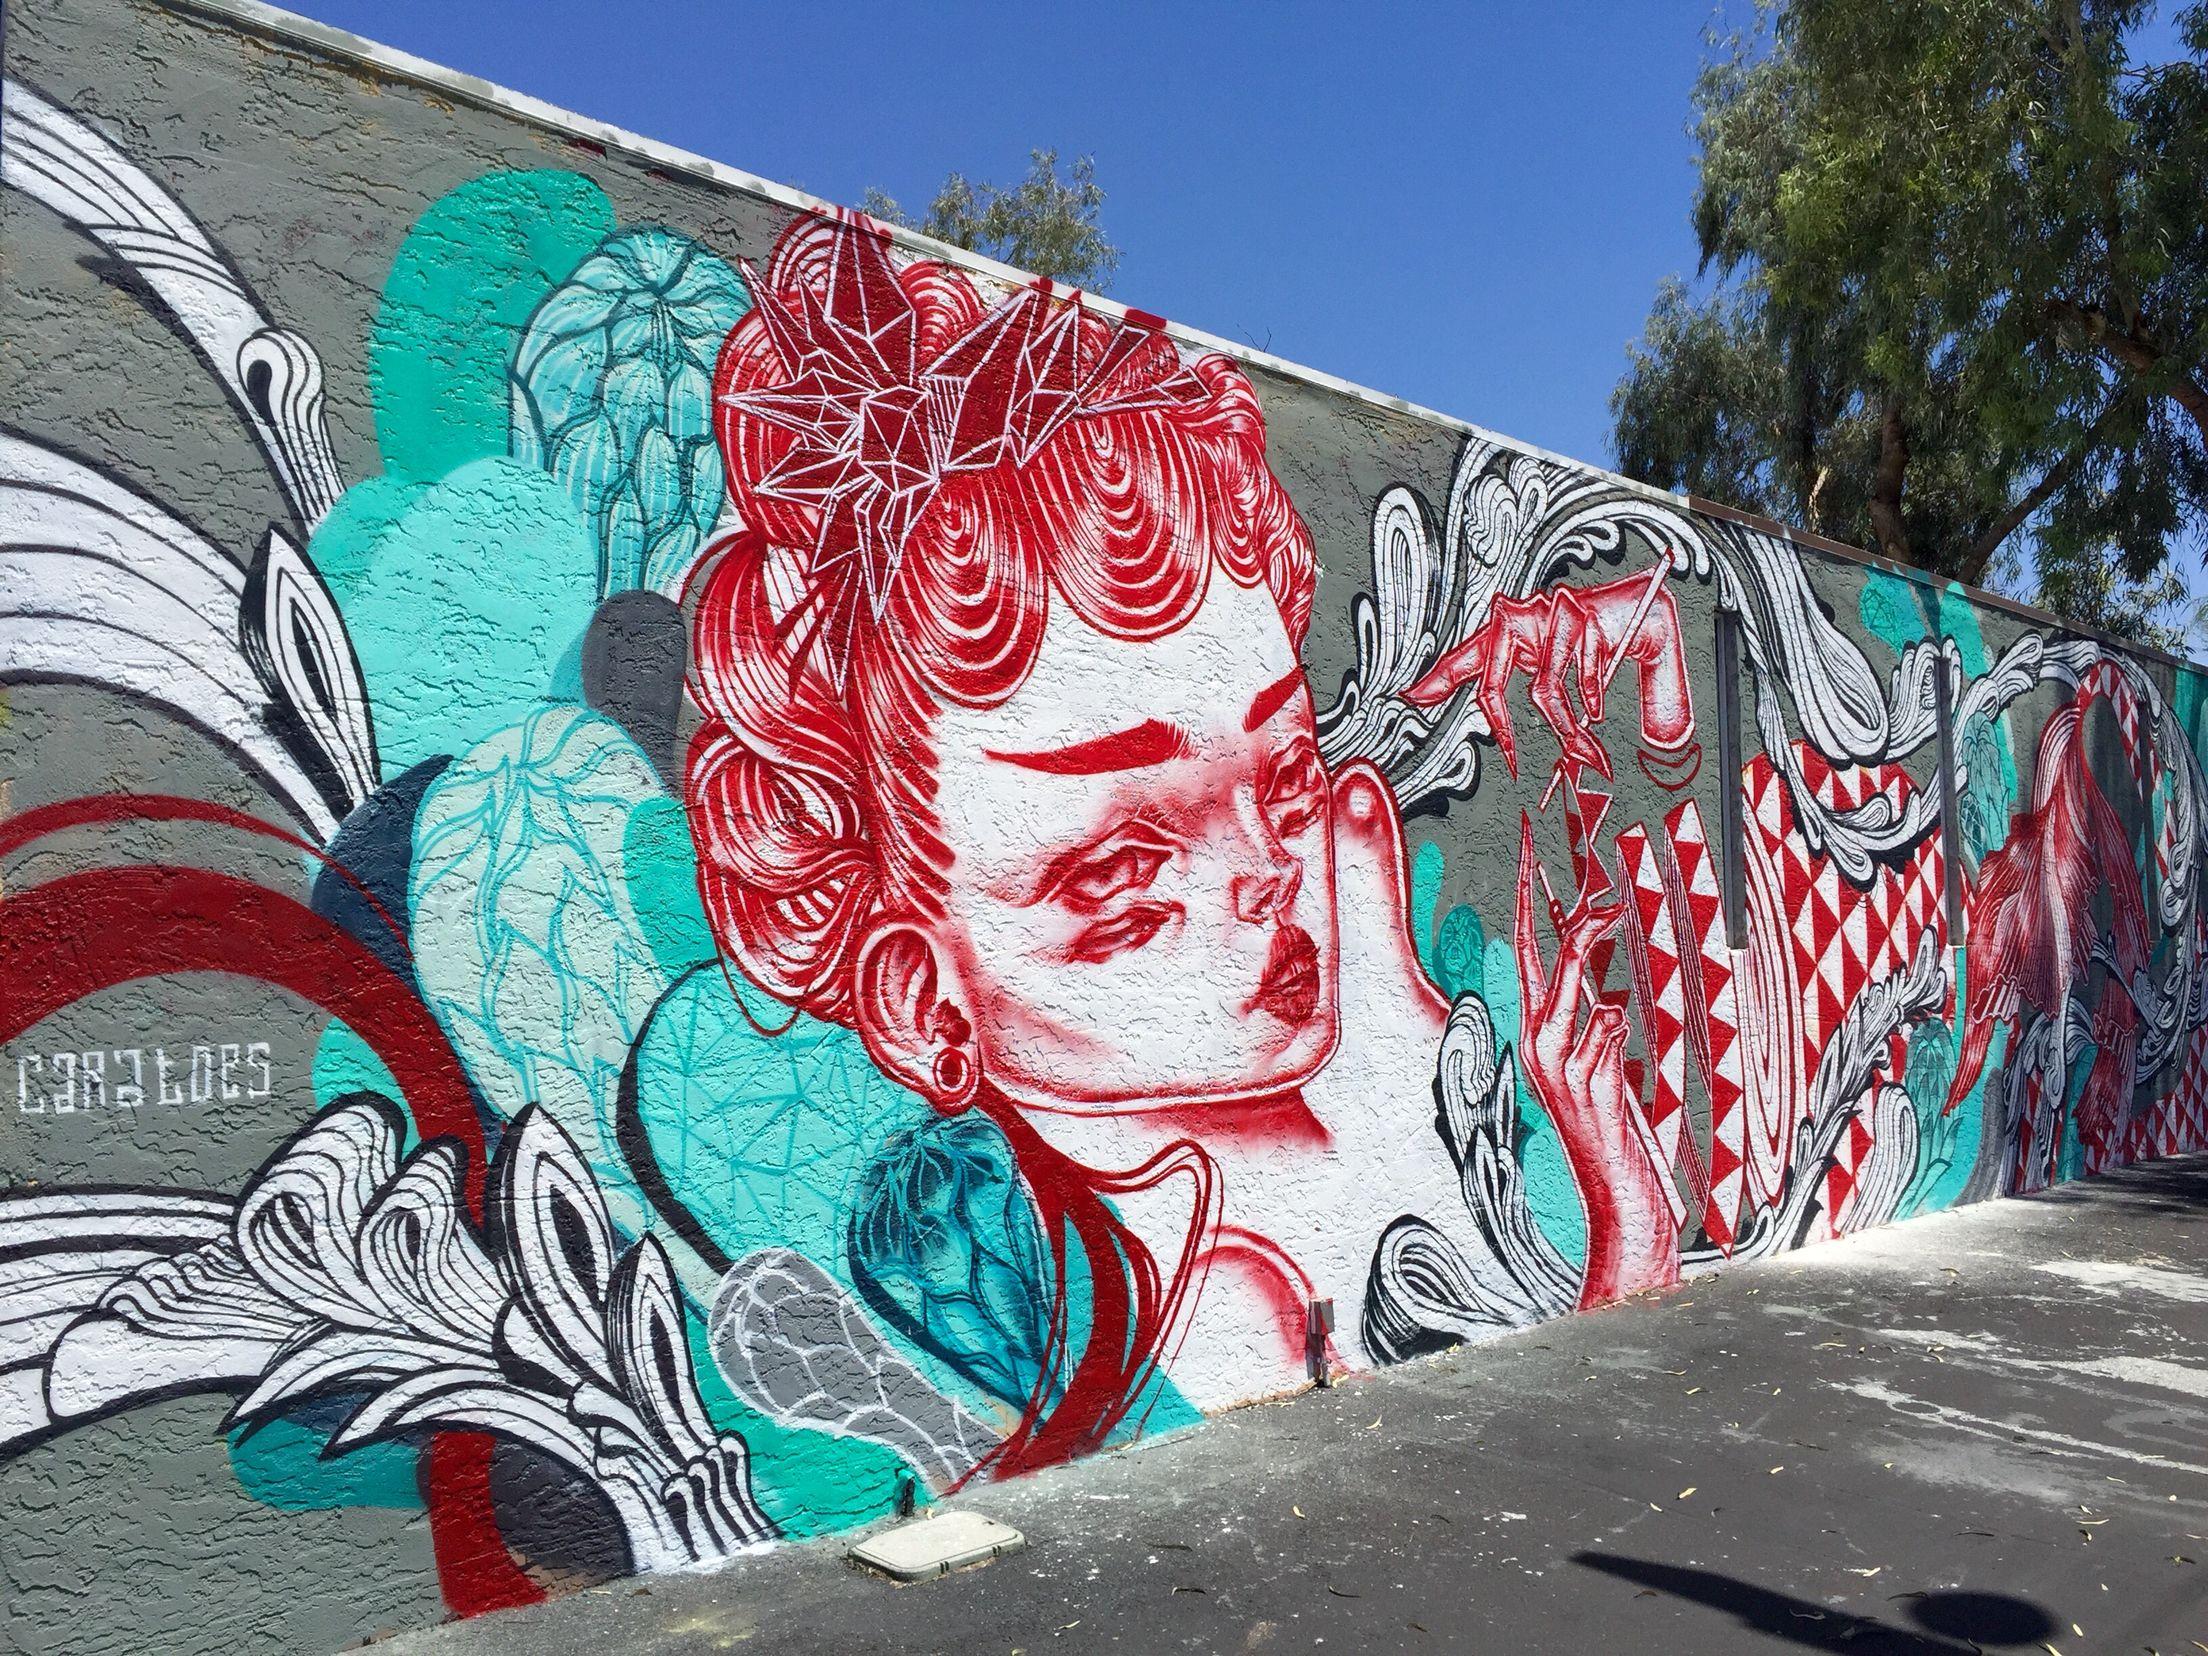 Graffiti art diy - Midtown Phoenix Phoenix Az Wallart Urban Art Mural Street Art